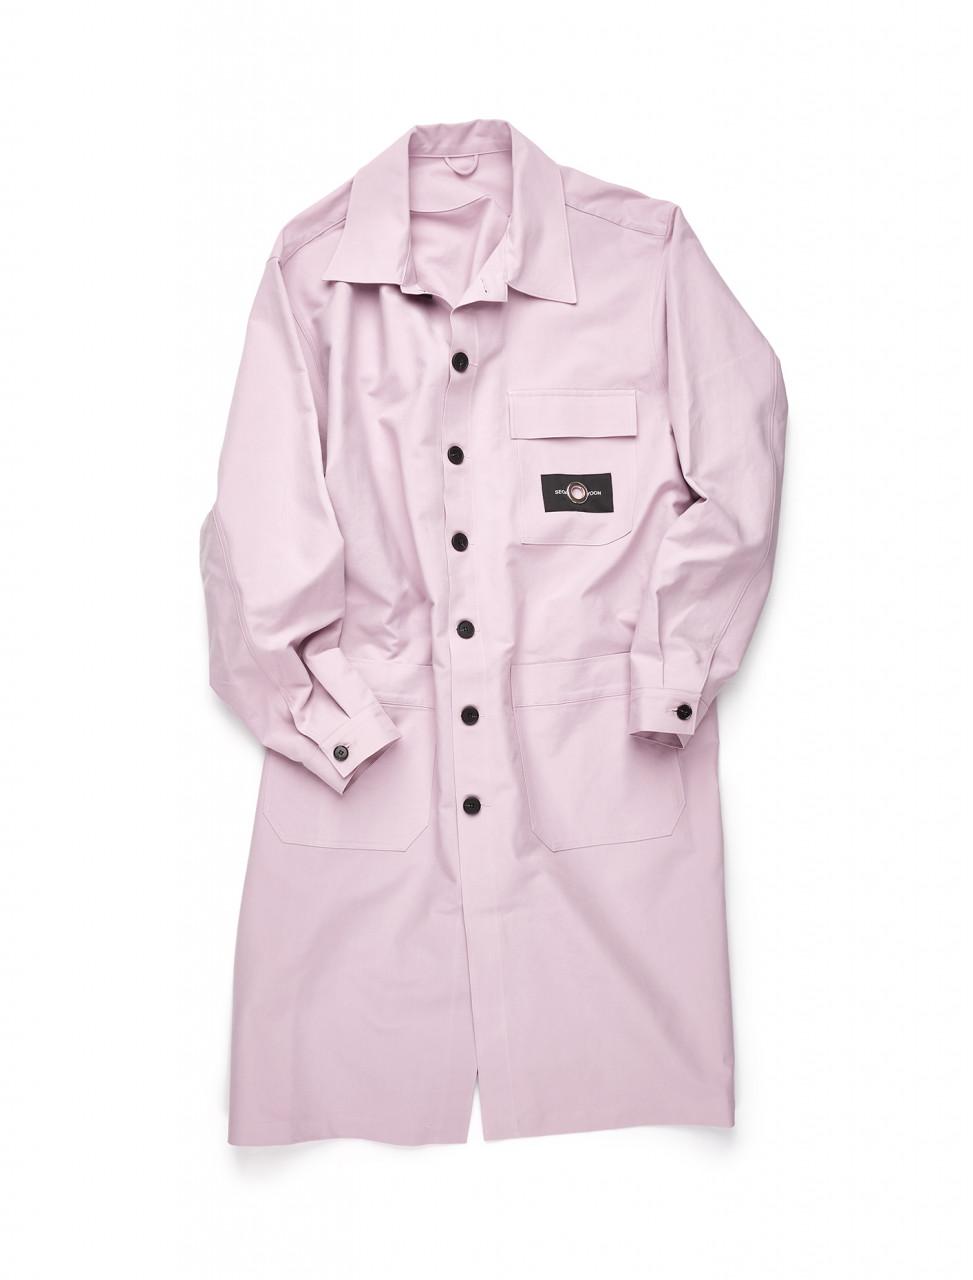 351-SWAW20-002 SEOKWOON YOON PINK LONG COAT